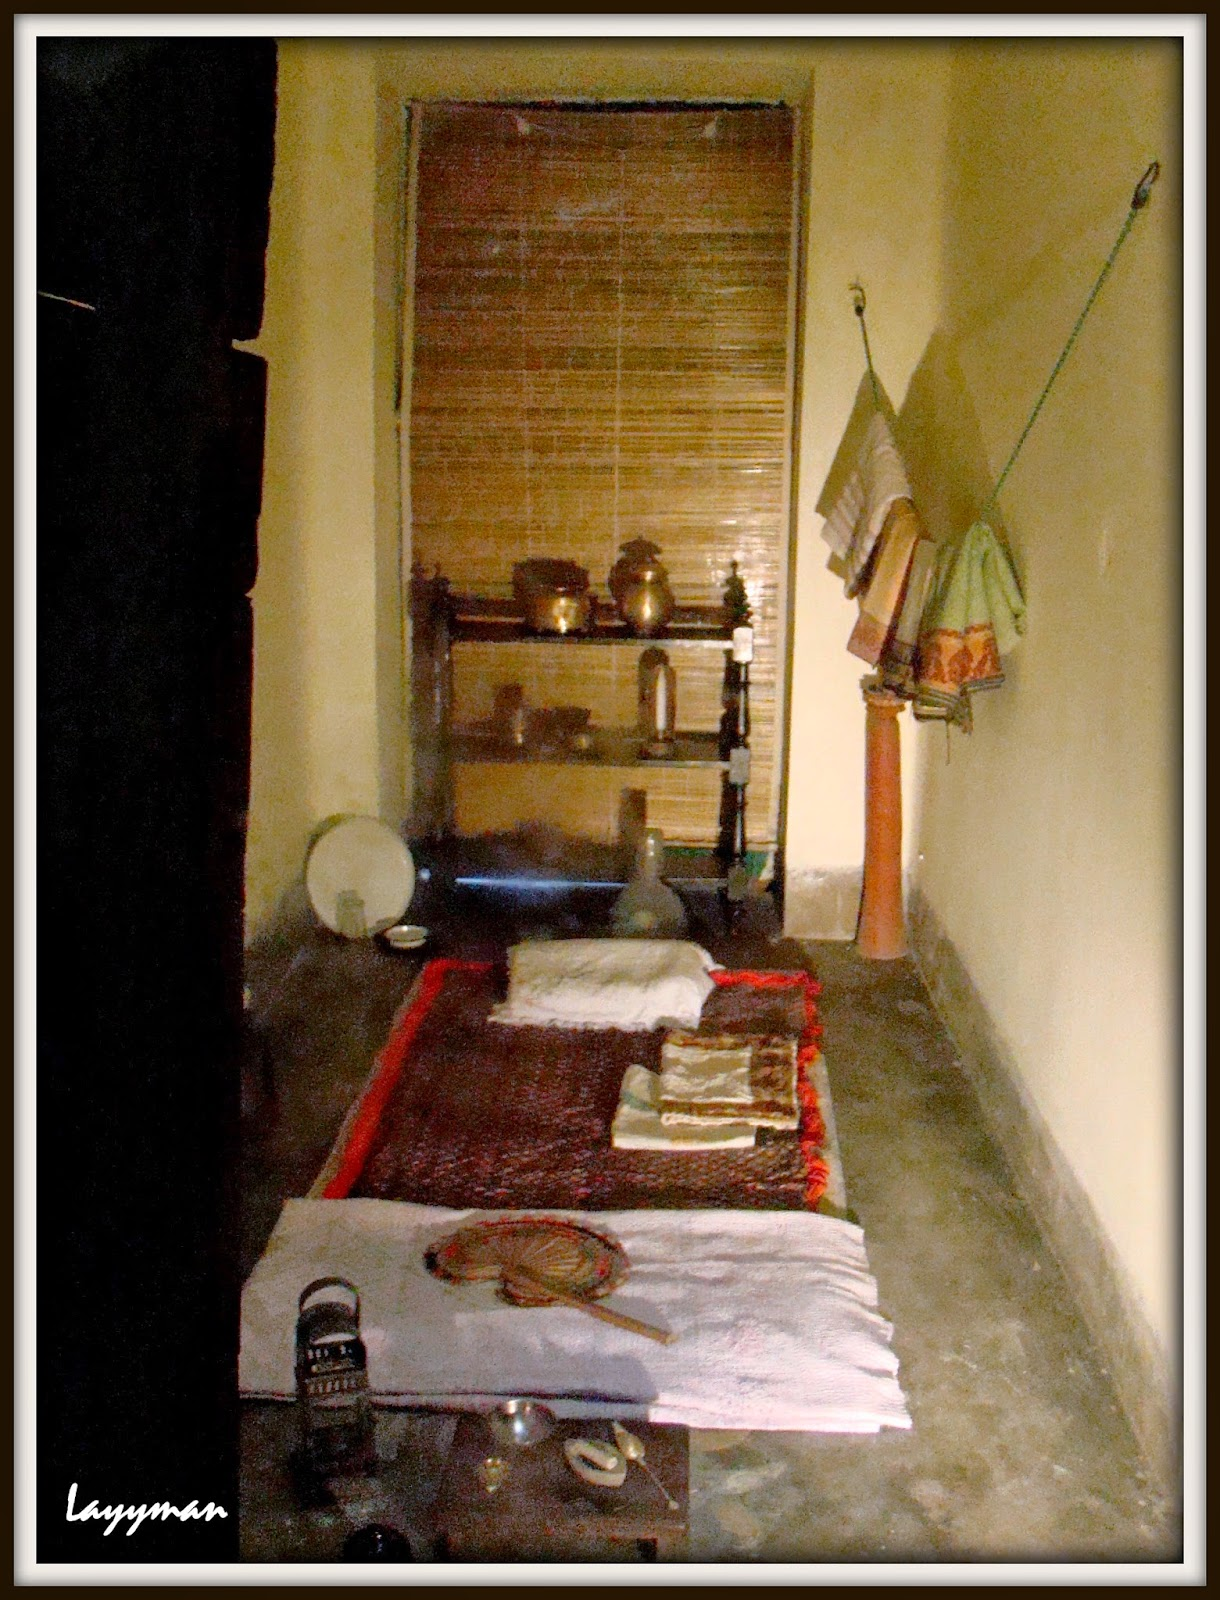 Family Maternity Room (Antur Ghar). Jorasanko Thakur Bari